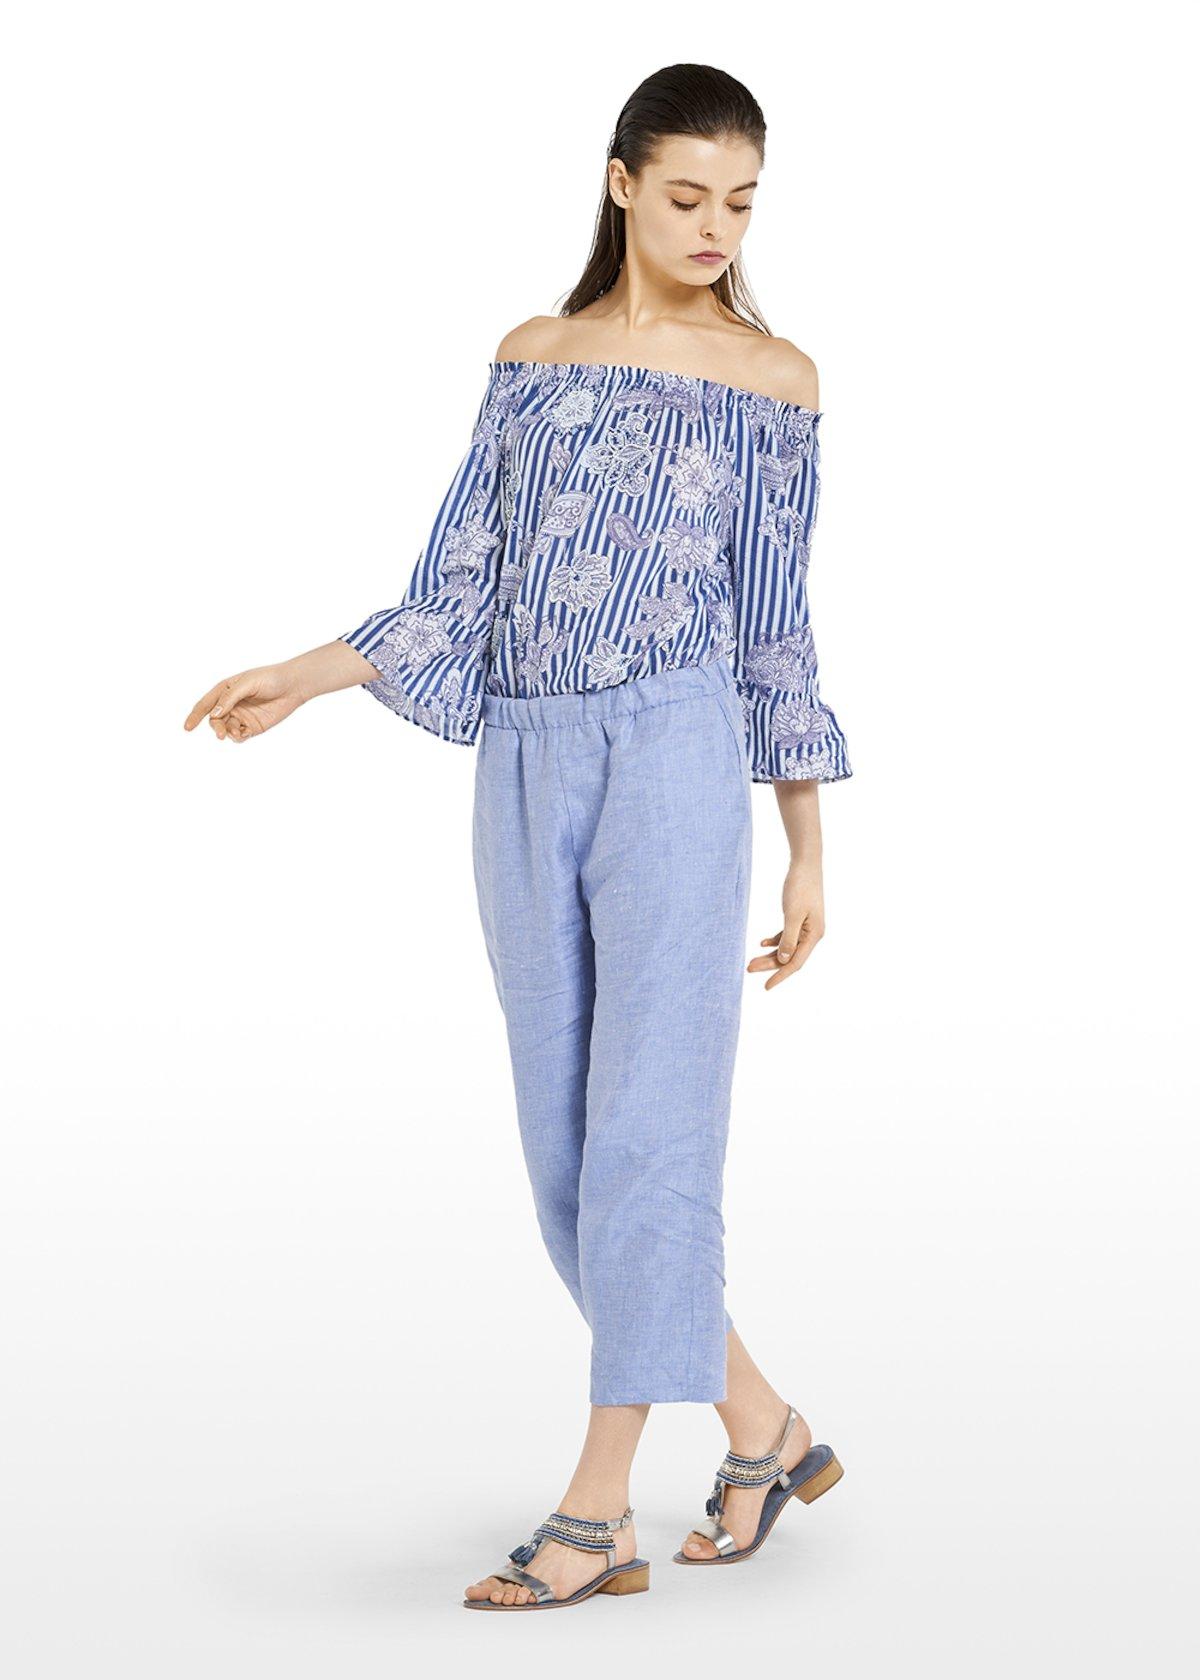 Capri pants Papiro in linen with elastic waits - Light Denim - Woman